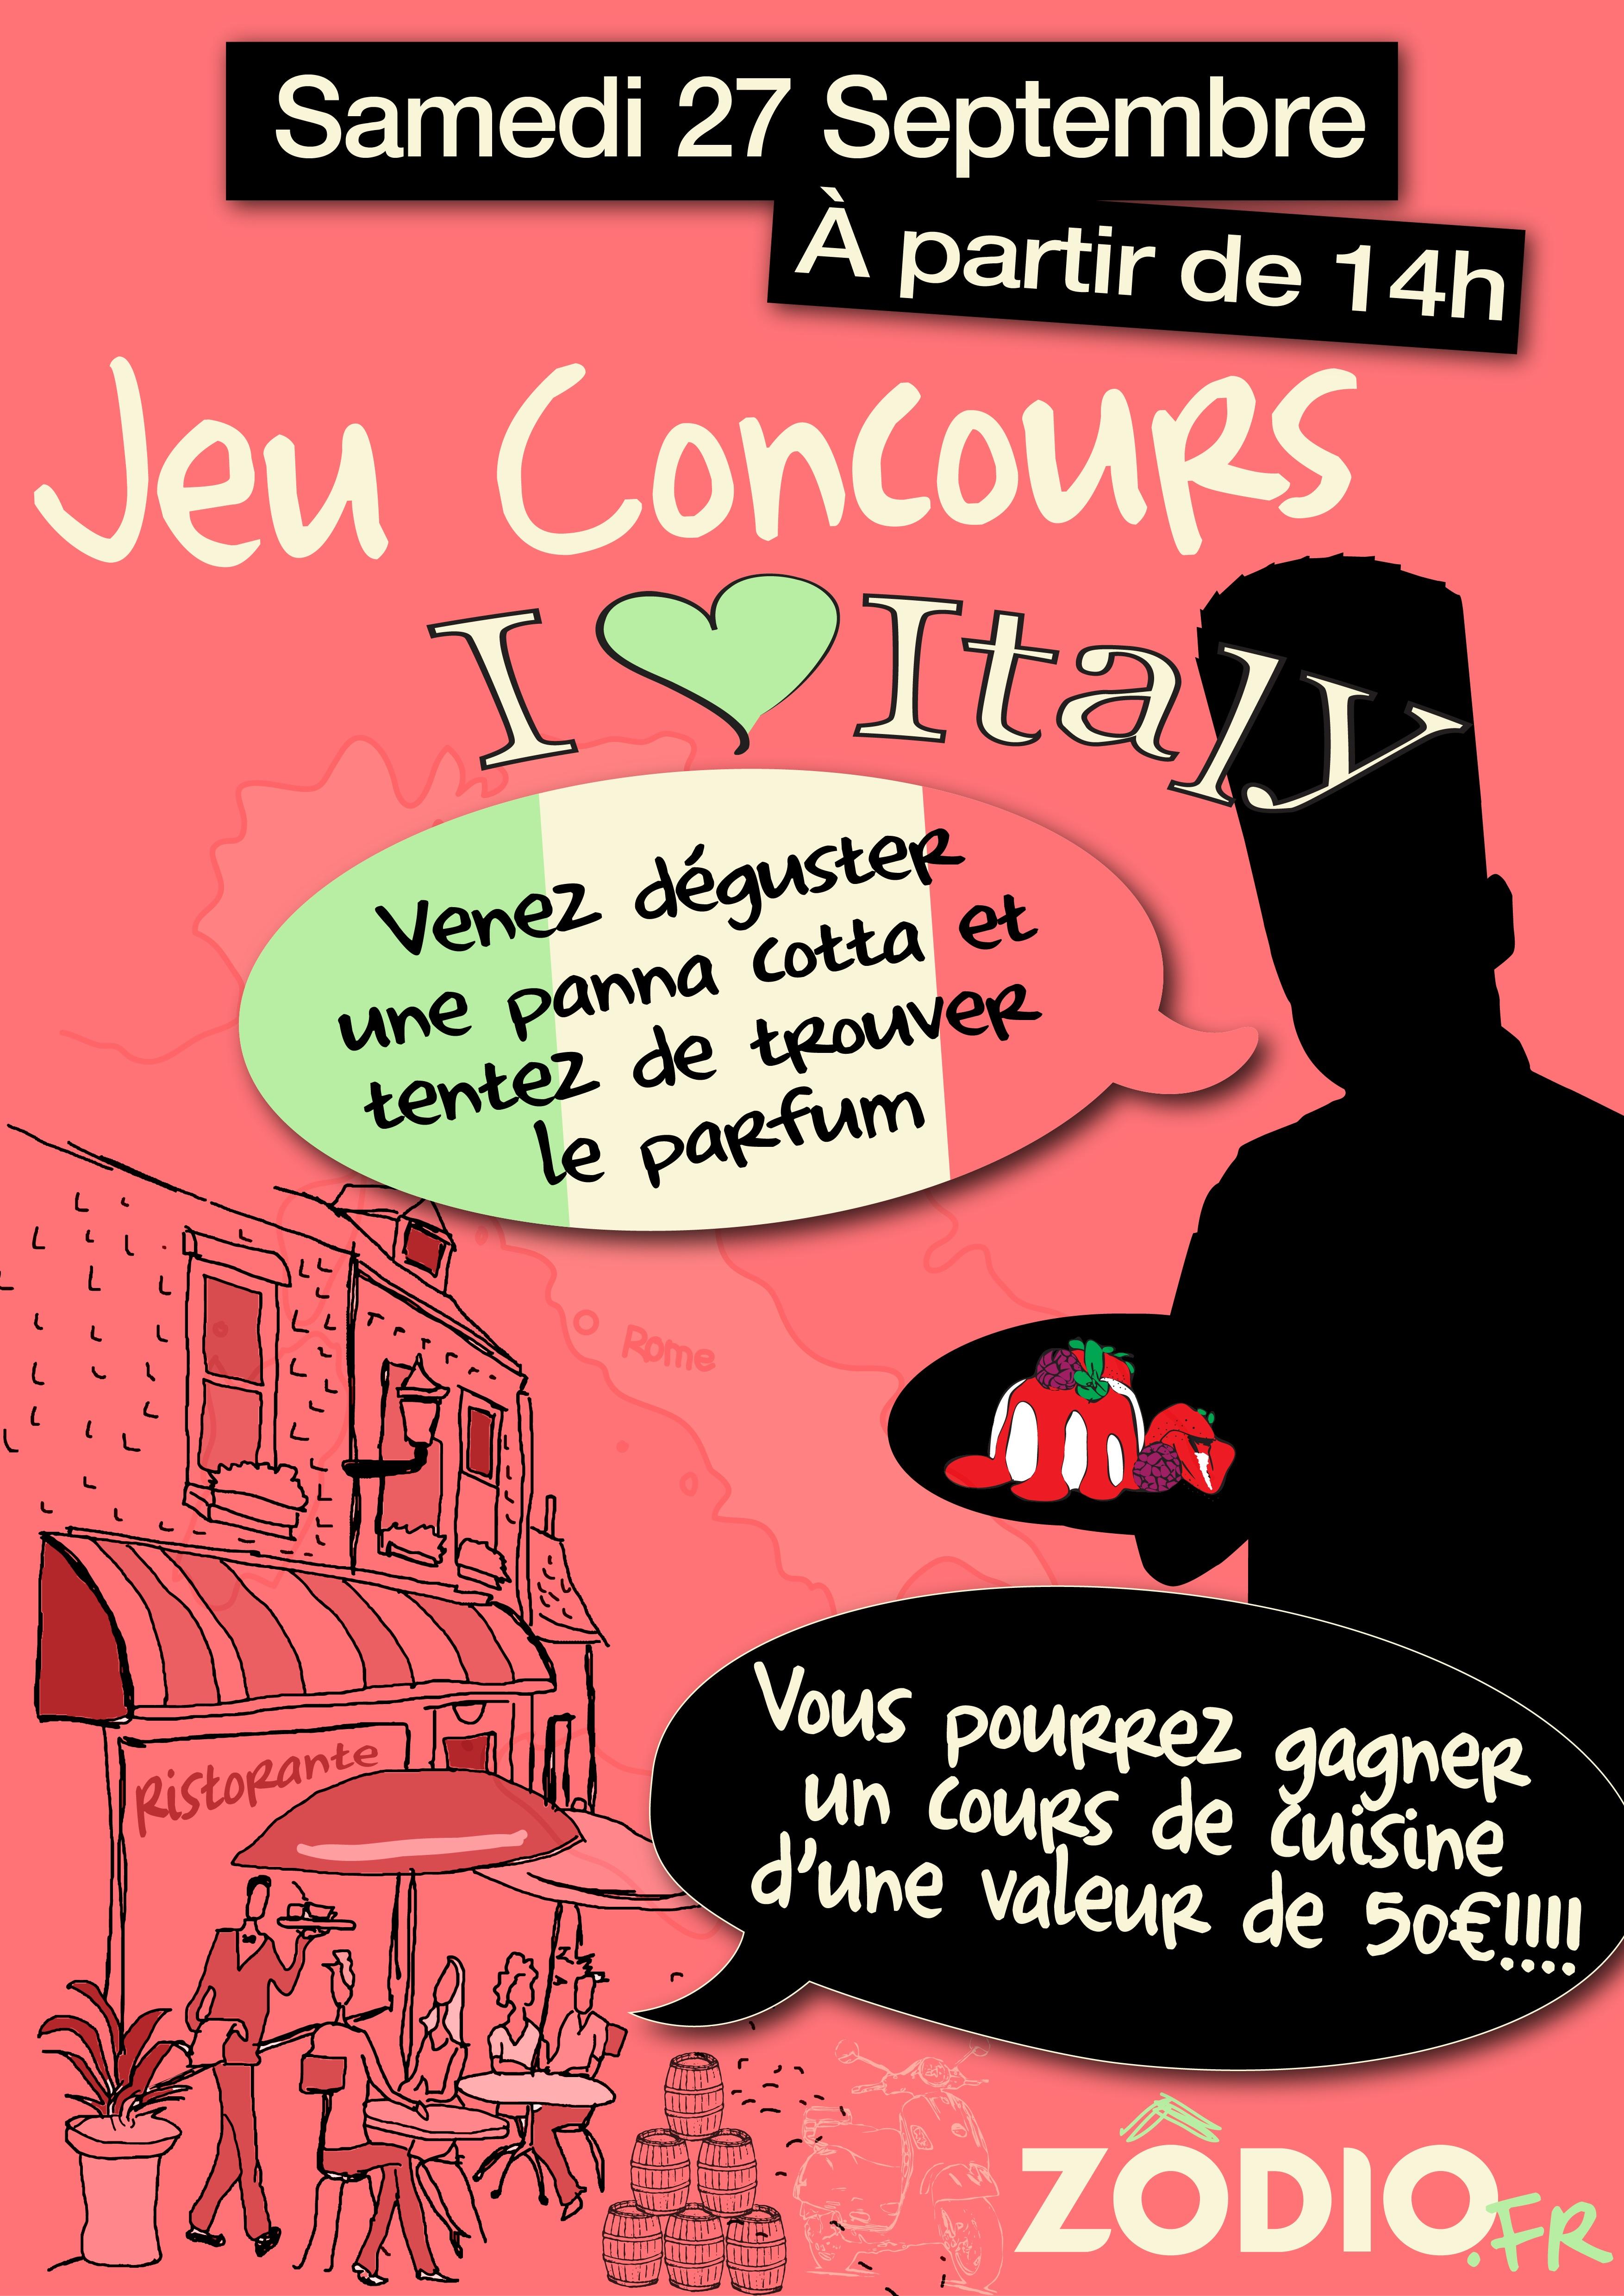 Concours panna cotta samedi 27 09 blog z dio - Zodio chambourcy atelier cuisine ...